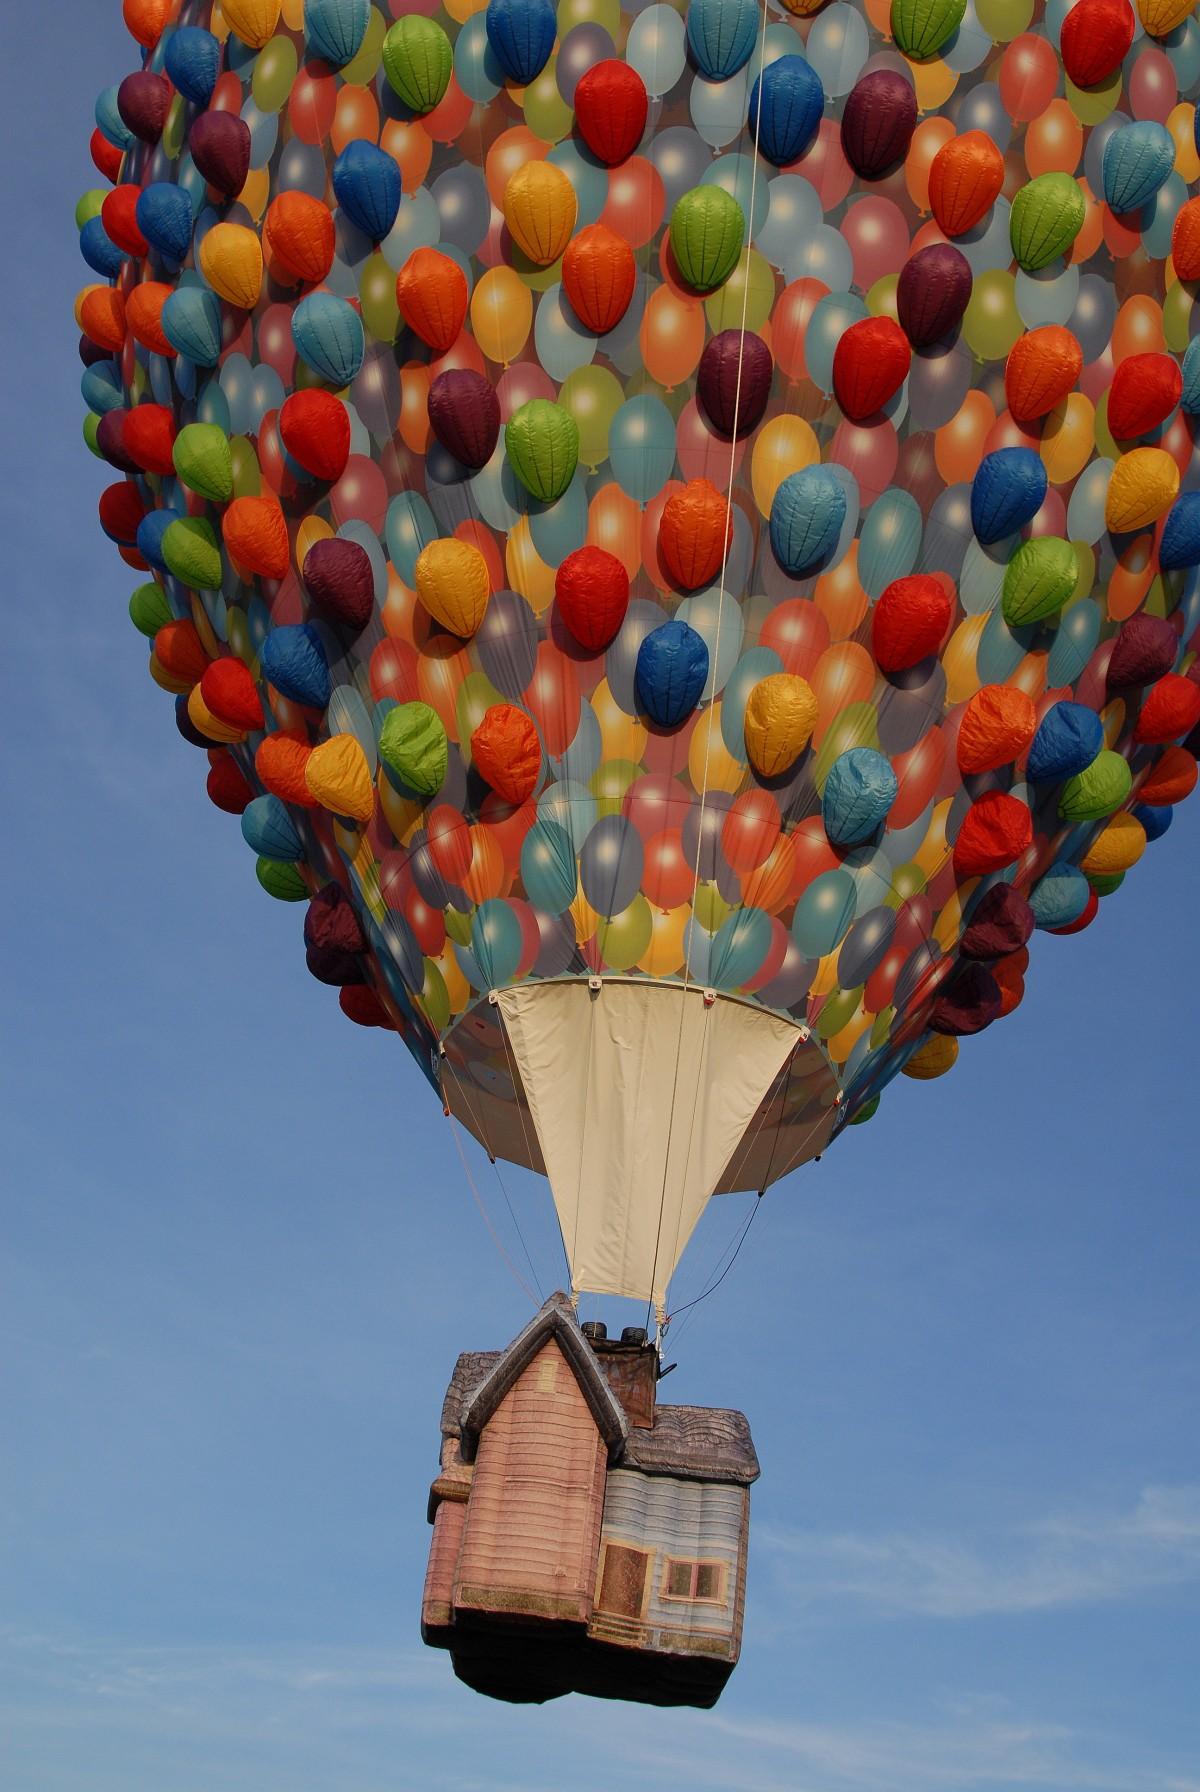 Kostenlose foto  Flgel Himmel Ballon Reise Flugzeug Fahrzeug Flug blau Spielzeug